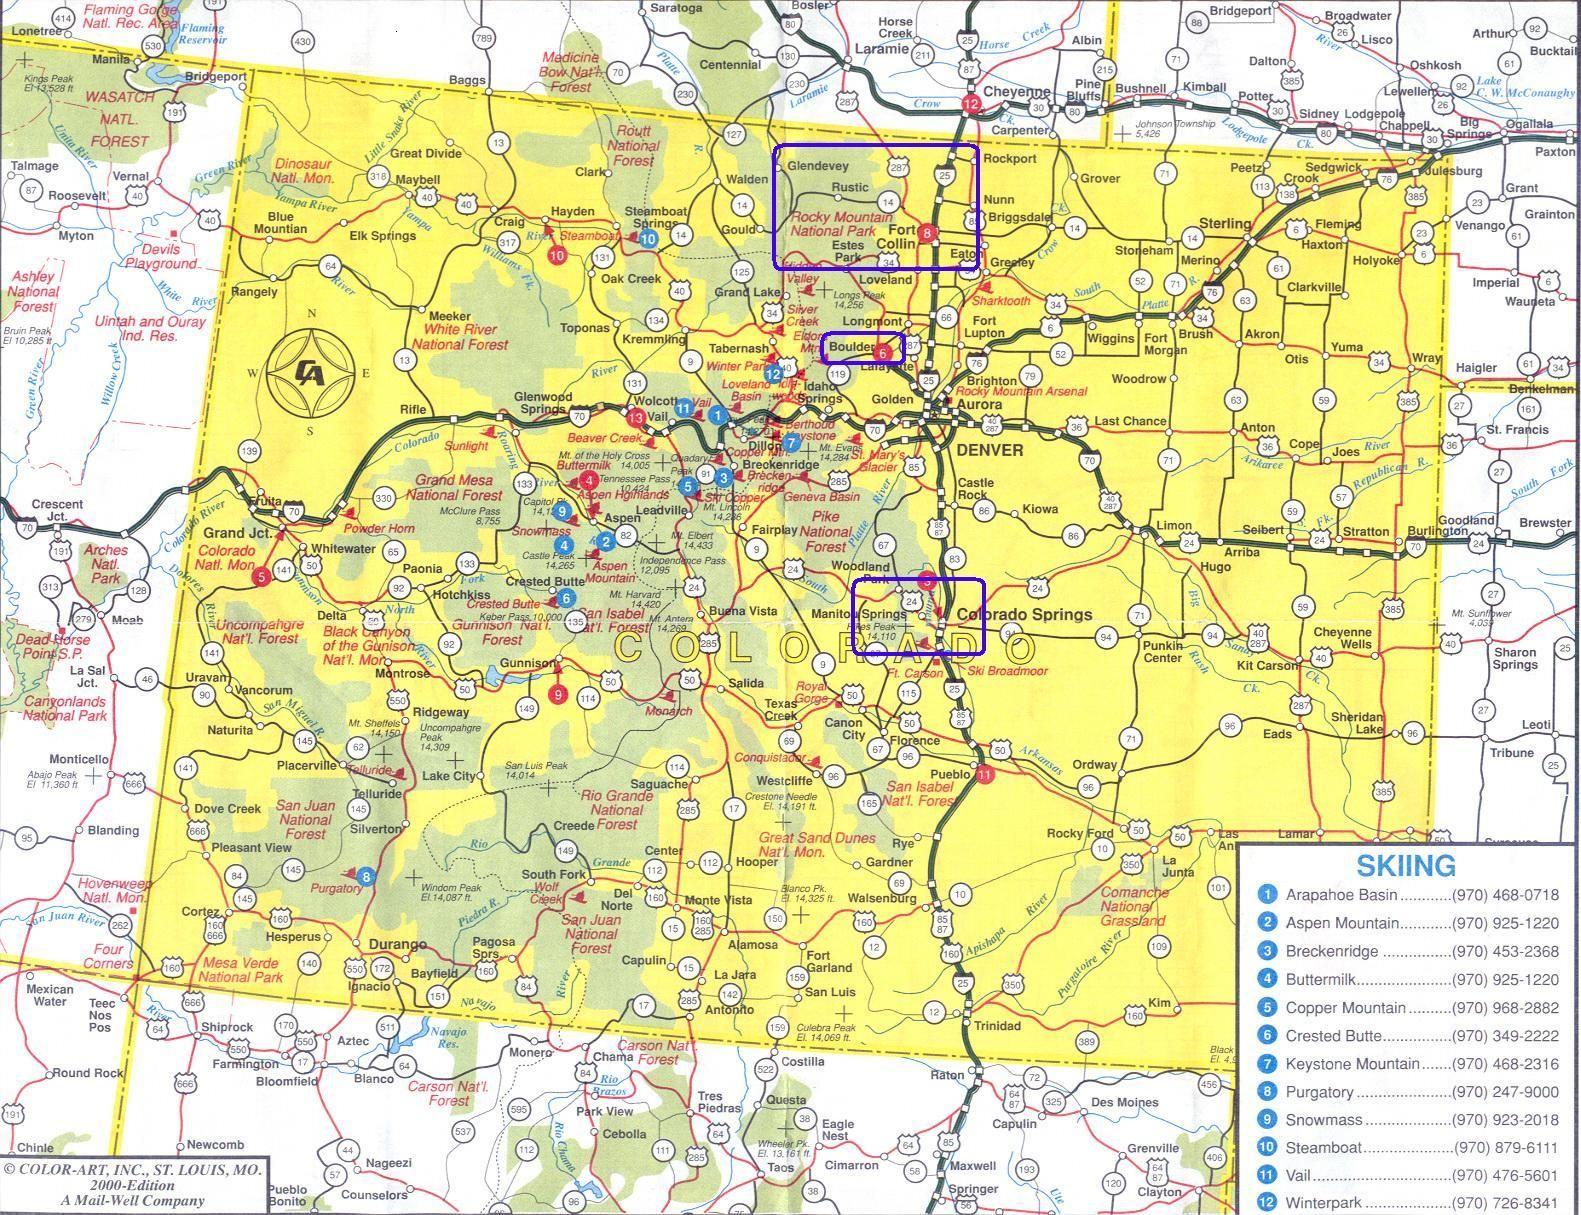 Yelp Denver Httpgrowingdenvercom Yelp Denver Pinterest - Colorado state road map